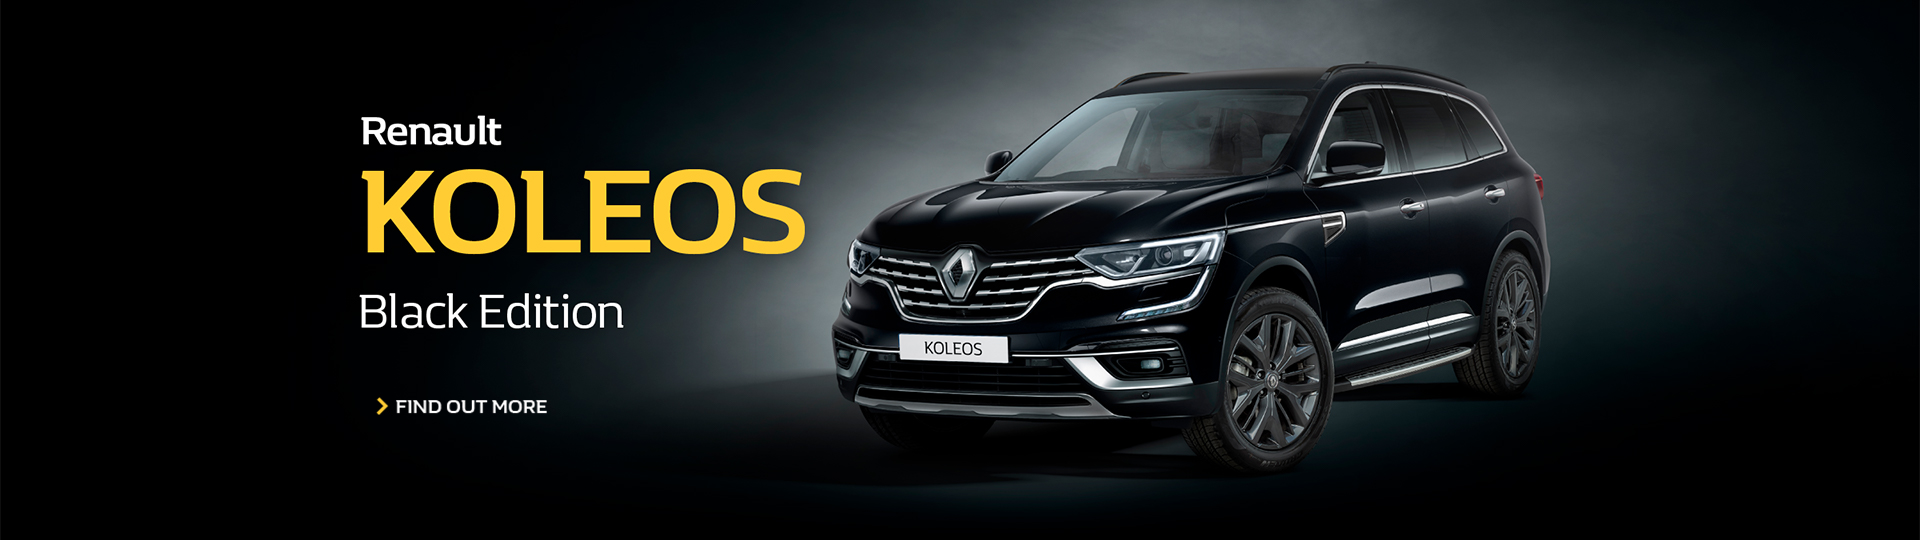 Renault KOLEOS Black Edition. Find out more